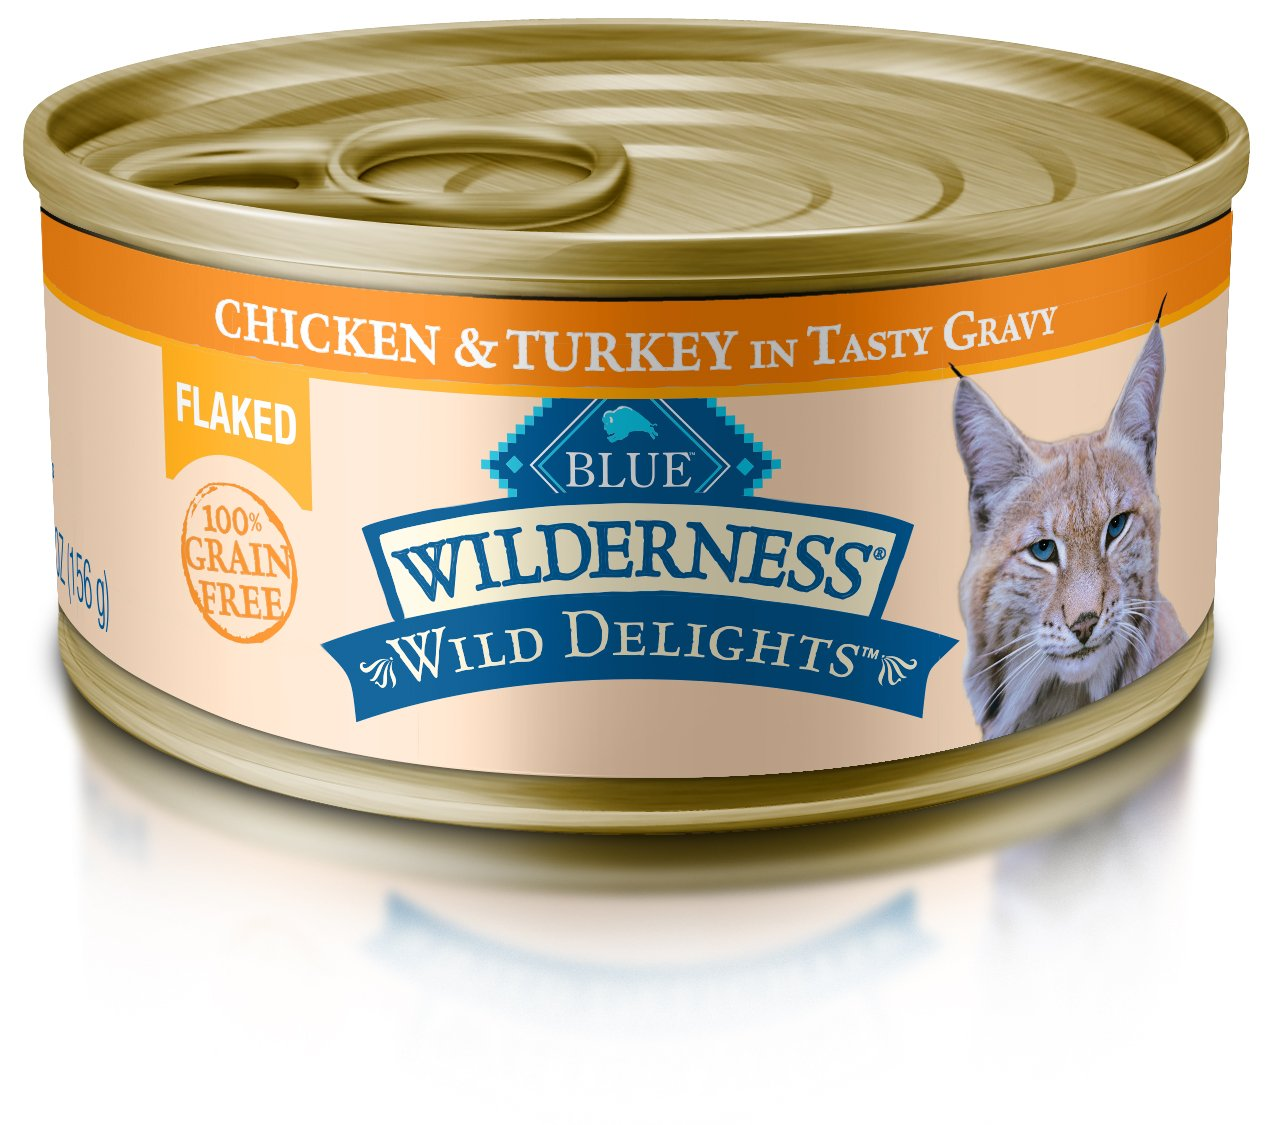 Blue Wilderness Wild Delights Adult Grain Free Flaked Chicken & Turkey In Tasty Gravy Wet Cat Food 5.5-Oz (Pack Of 24) by Blue Buffalo